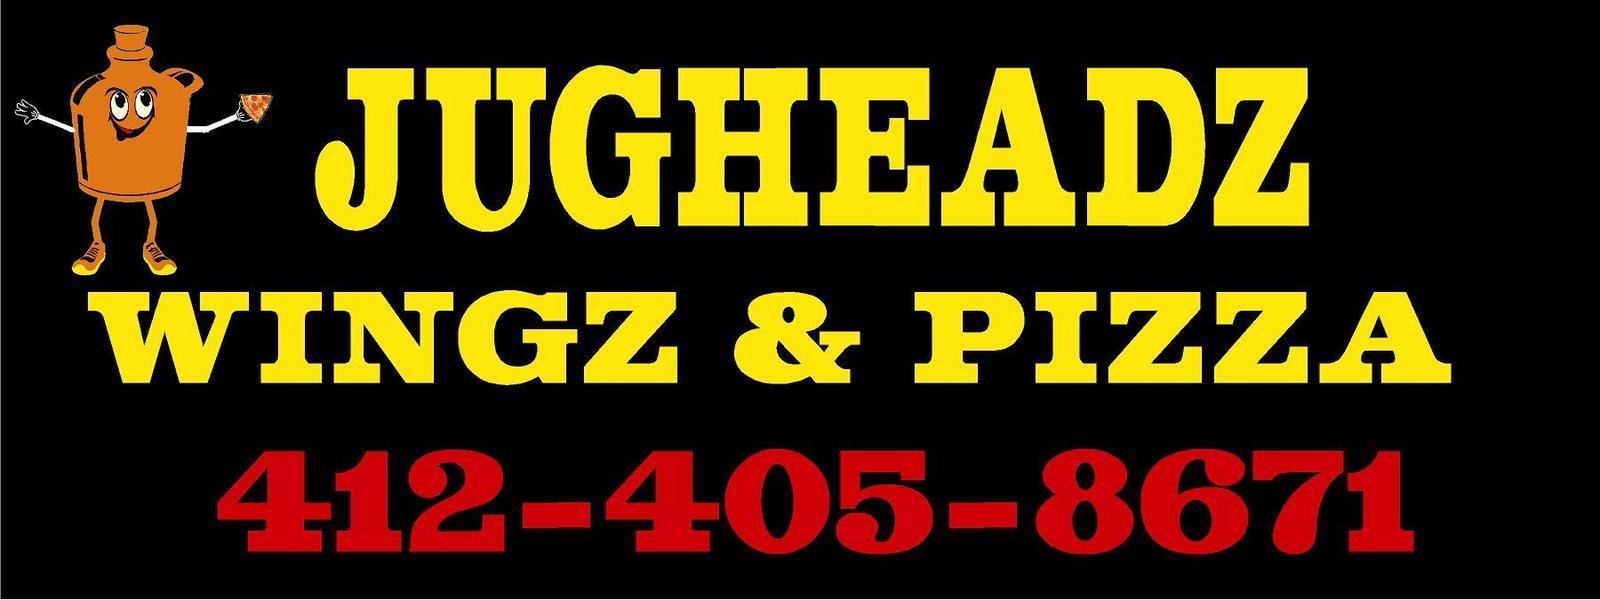 Jug Headz Wings And Pizza, Elizabeth PA